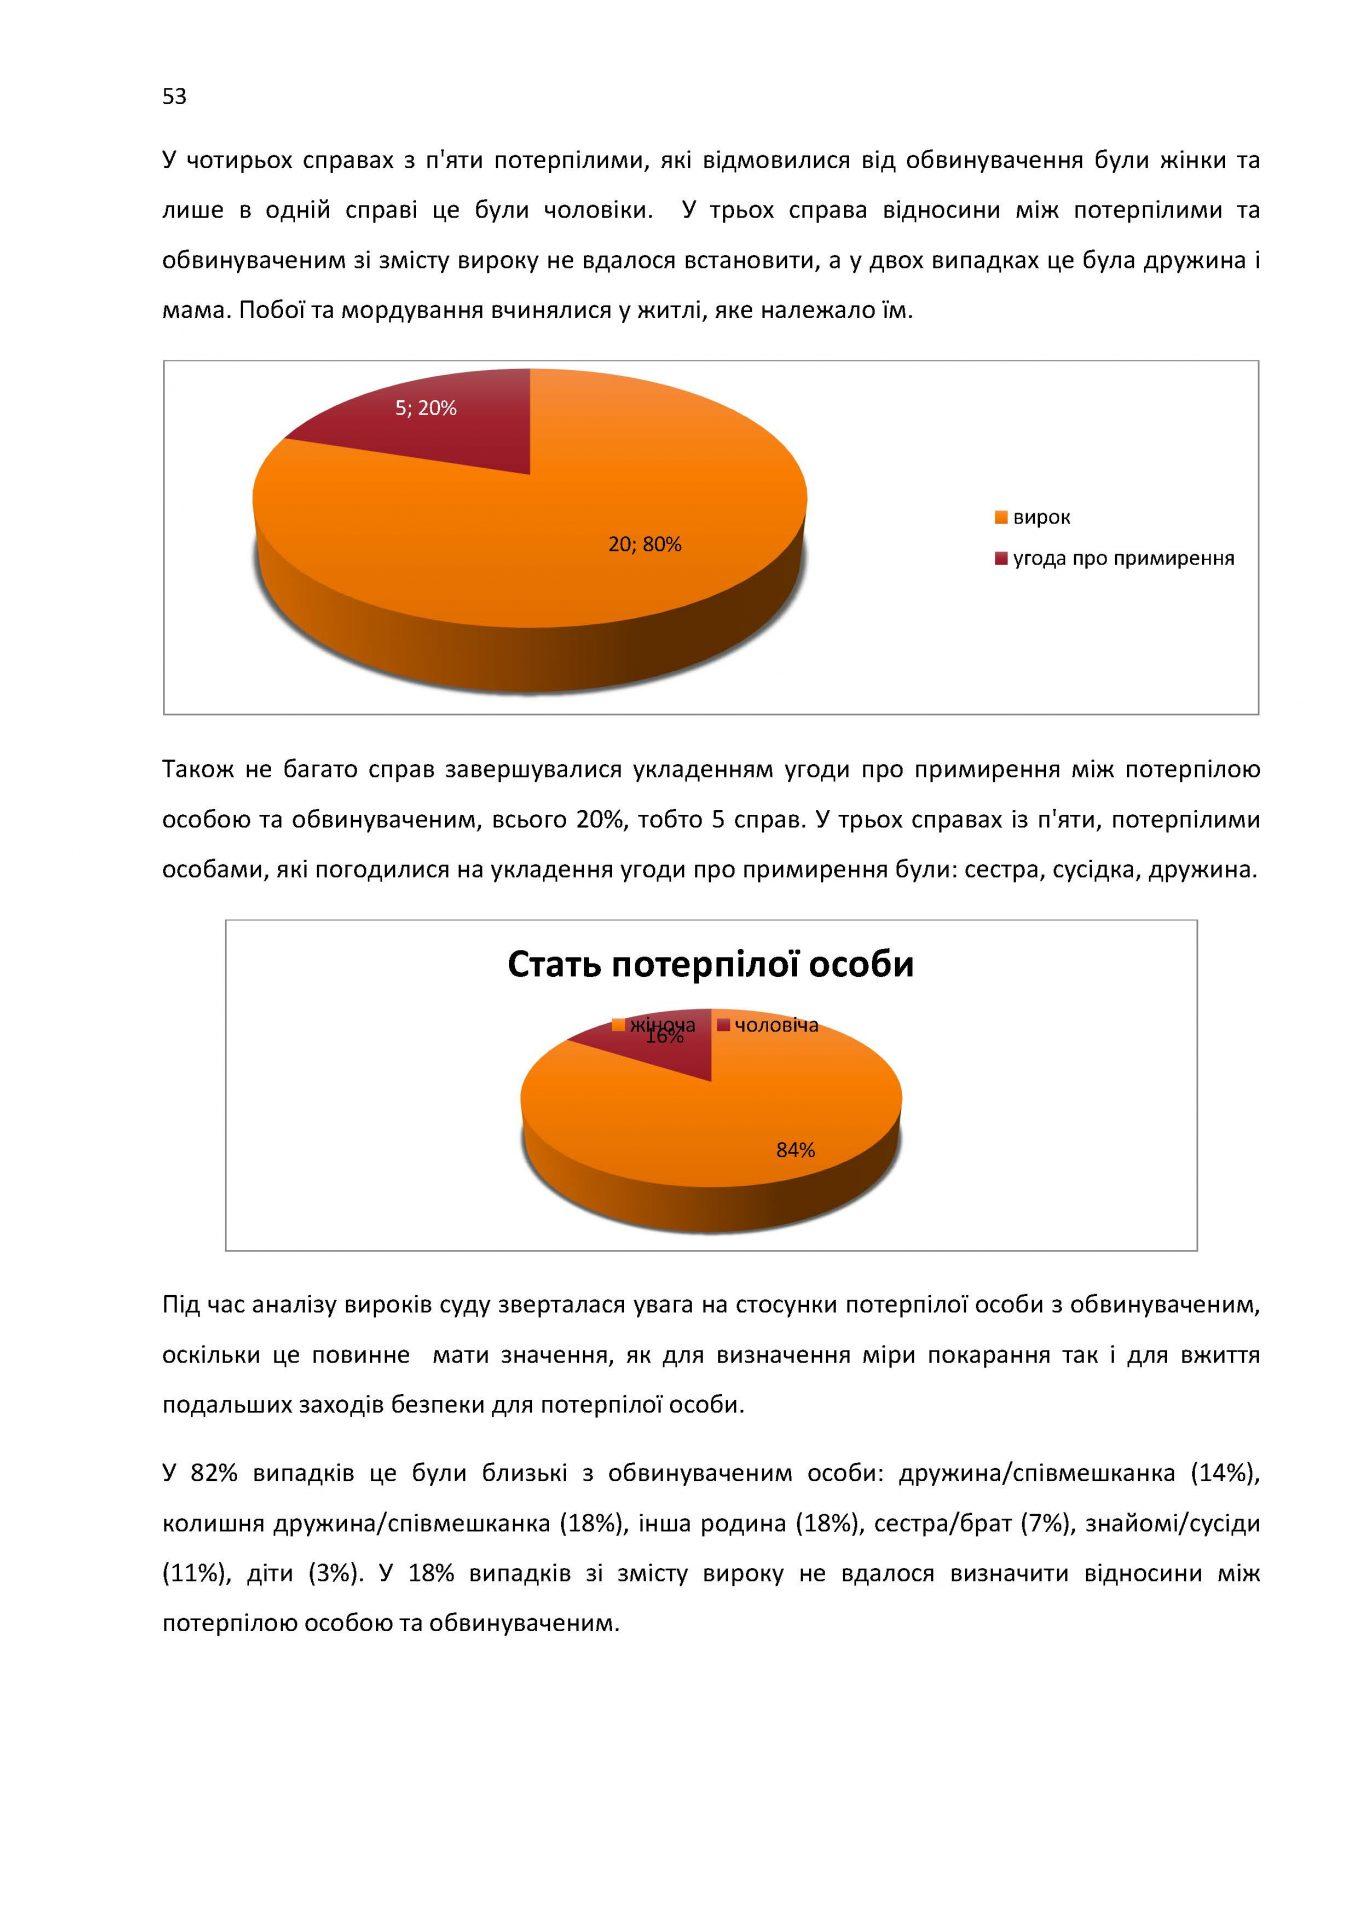 Draft Report monitoring print USAID_Страница_53